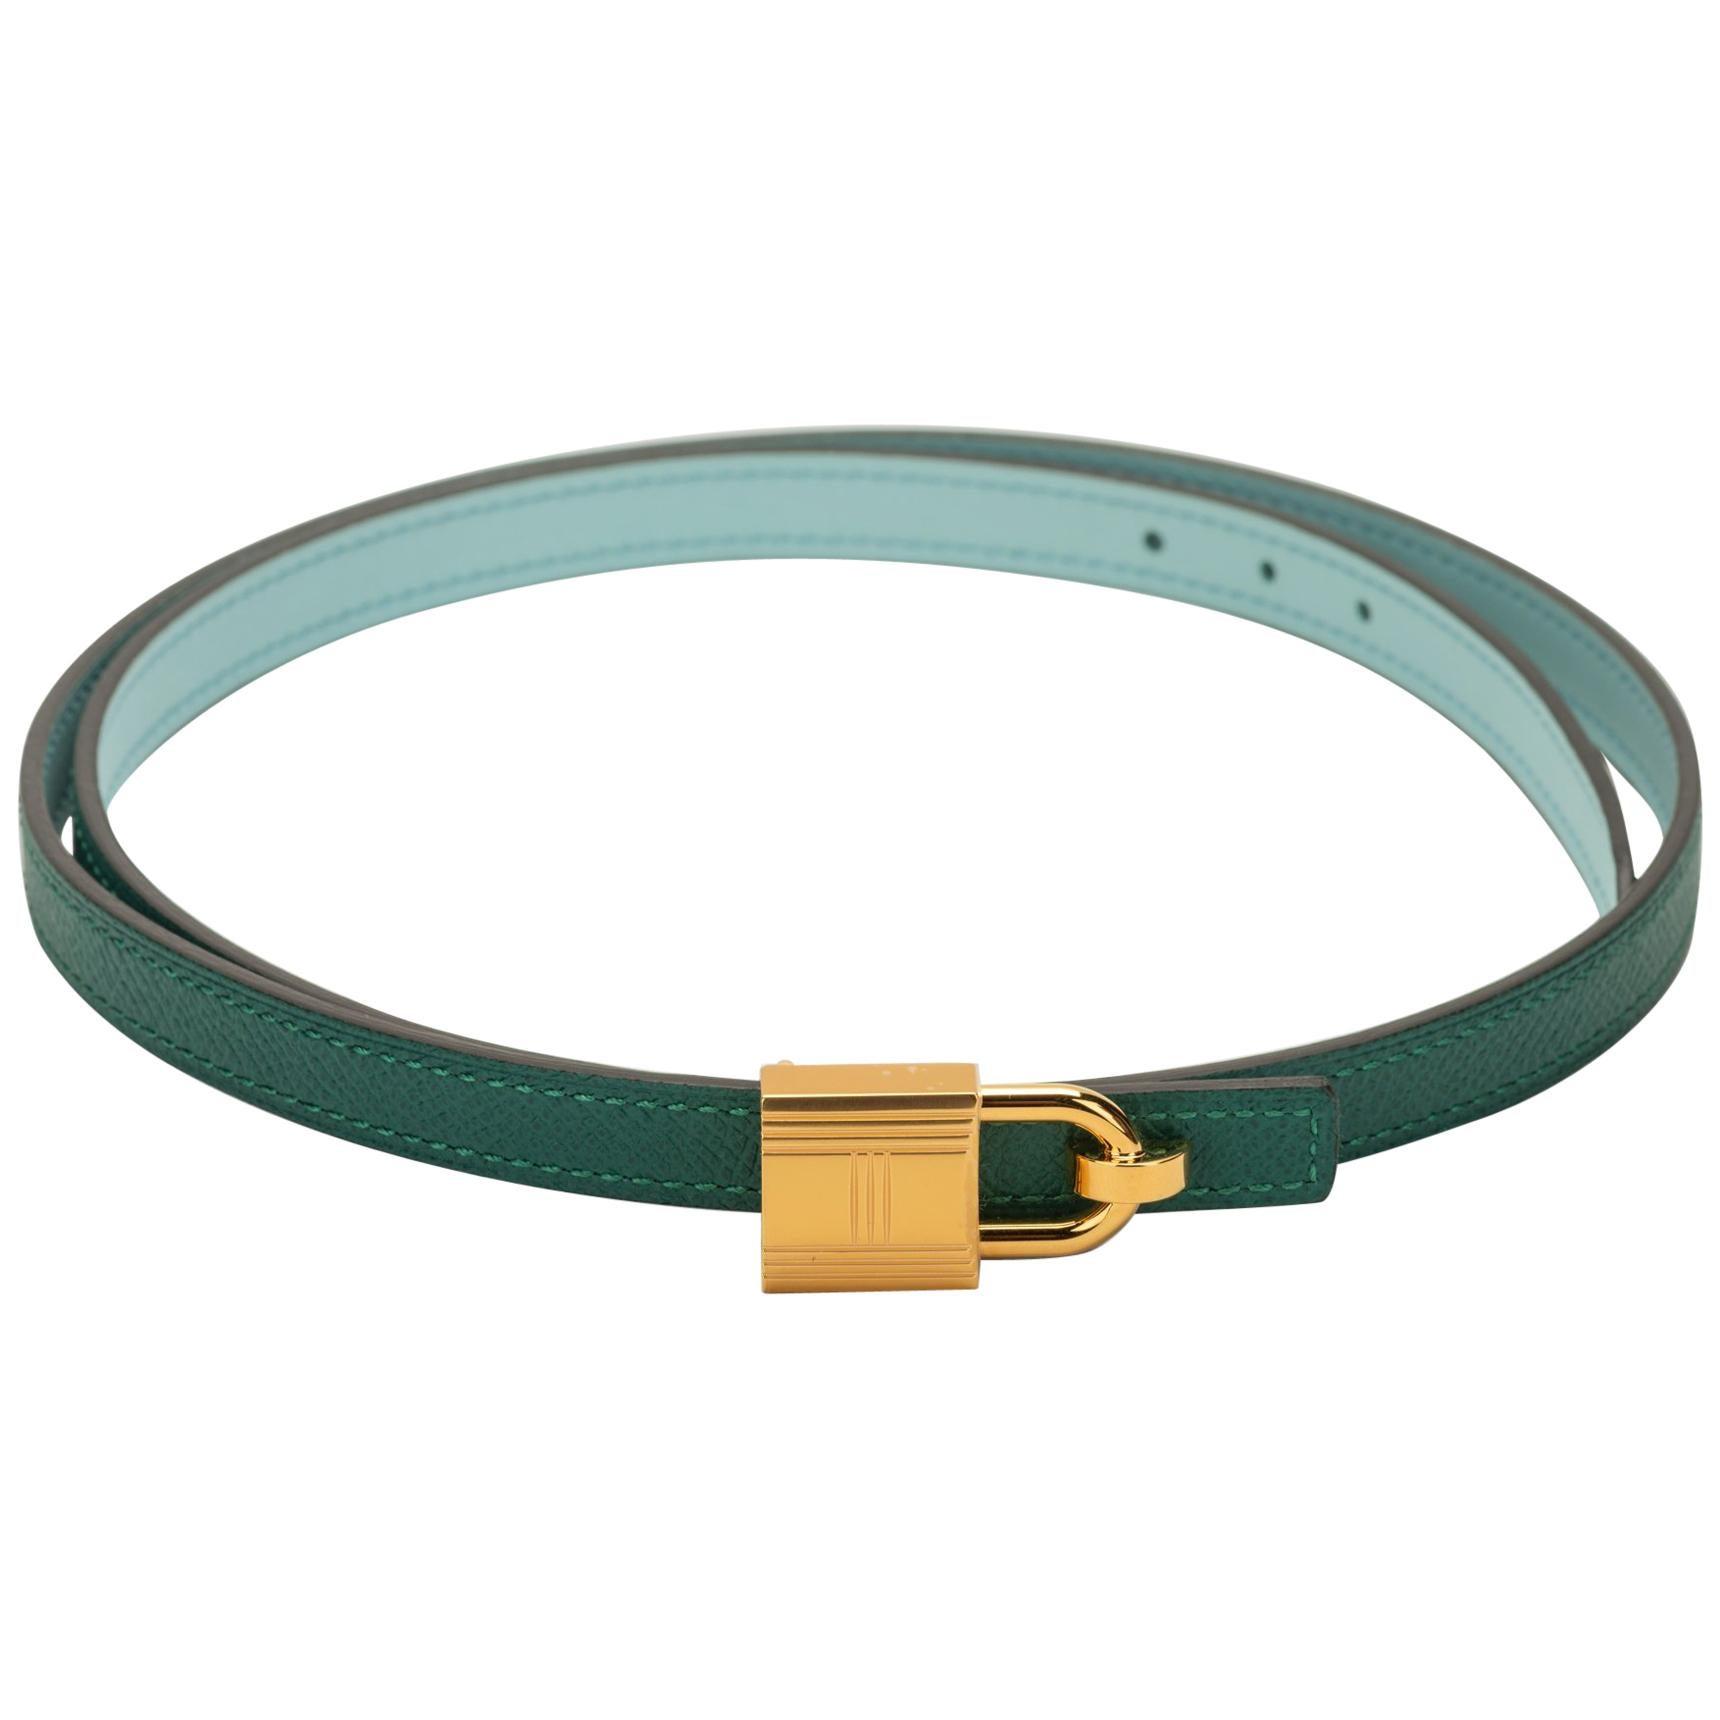 New in Box Hermes Green Blue Atolle Lock Belt